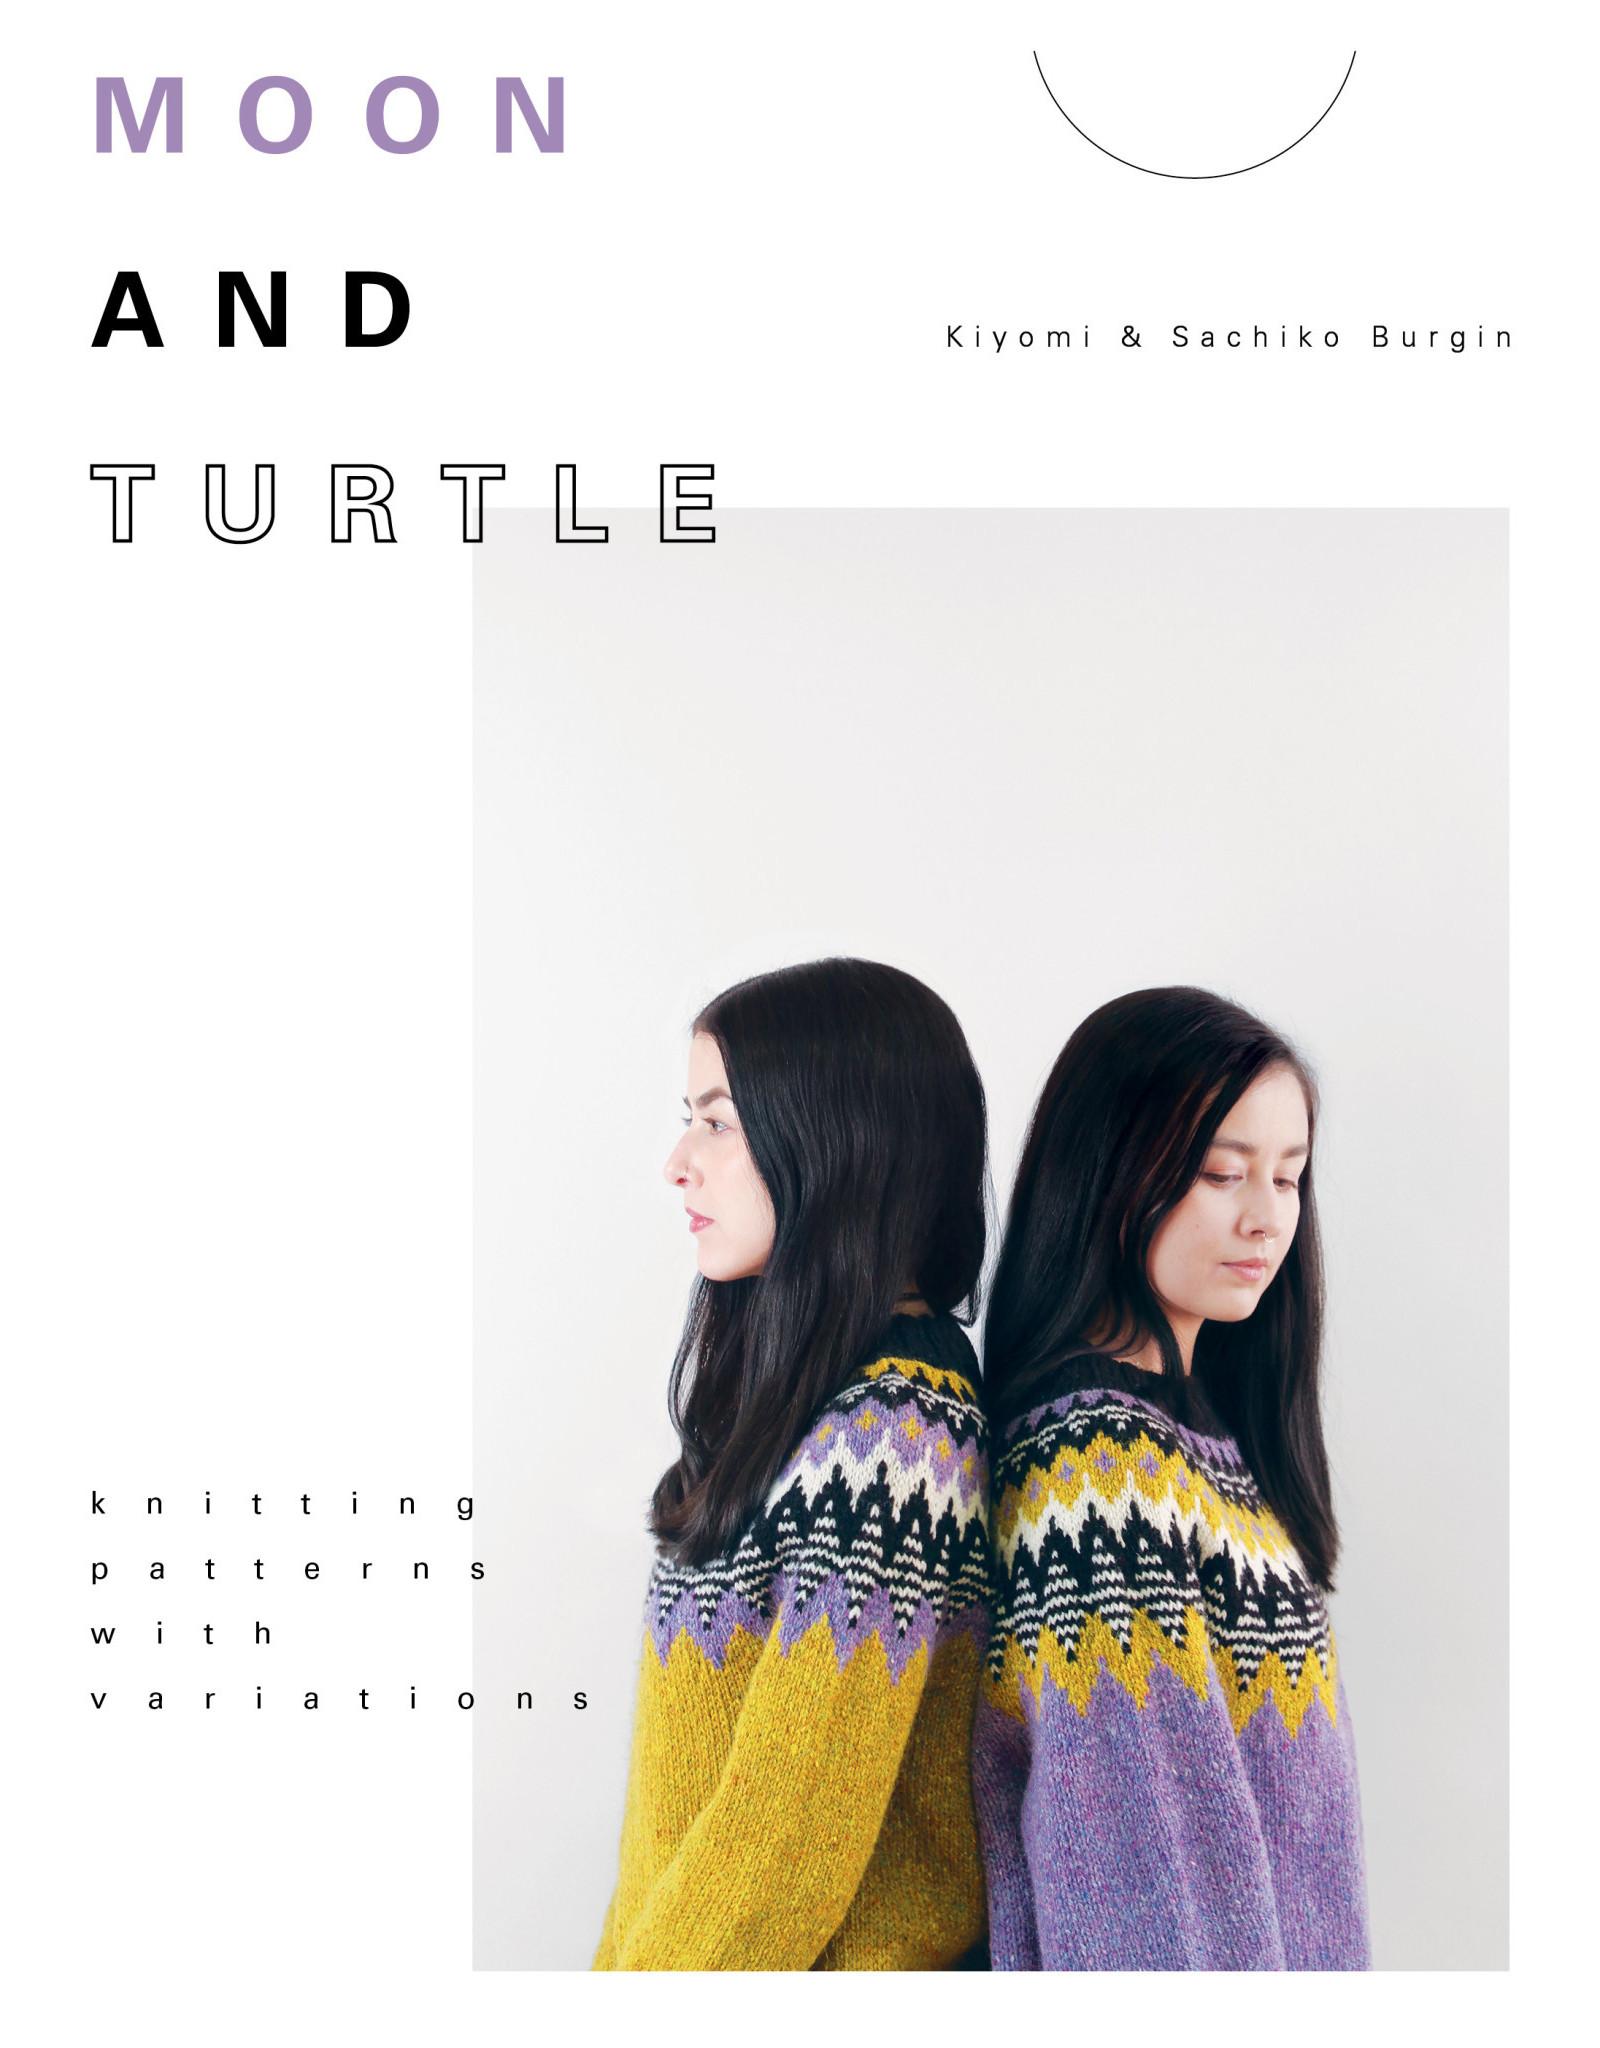 PomPom Magazine Moon and Turtle